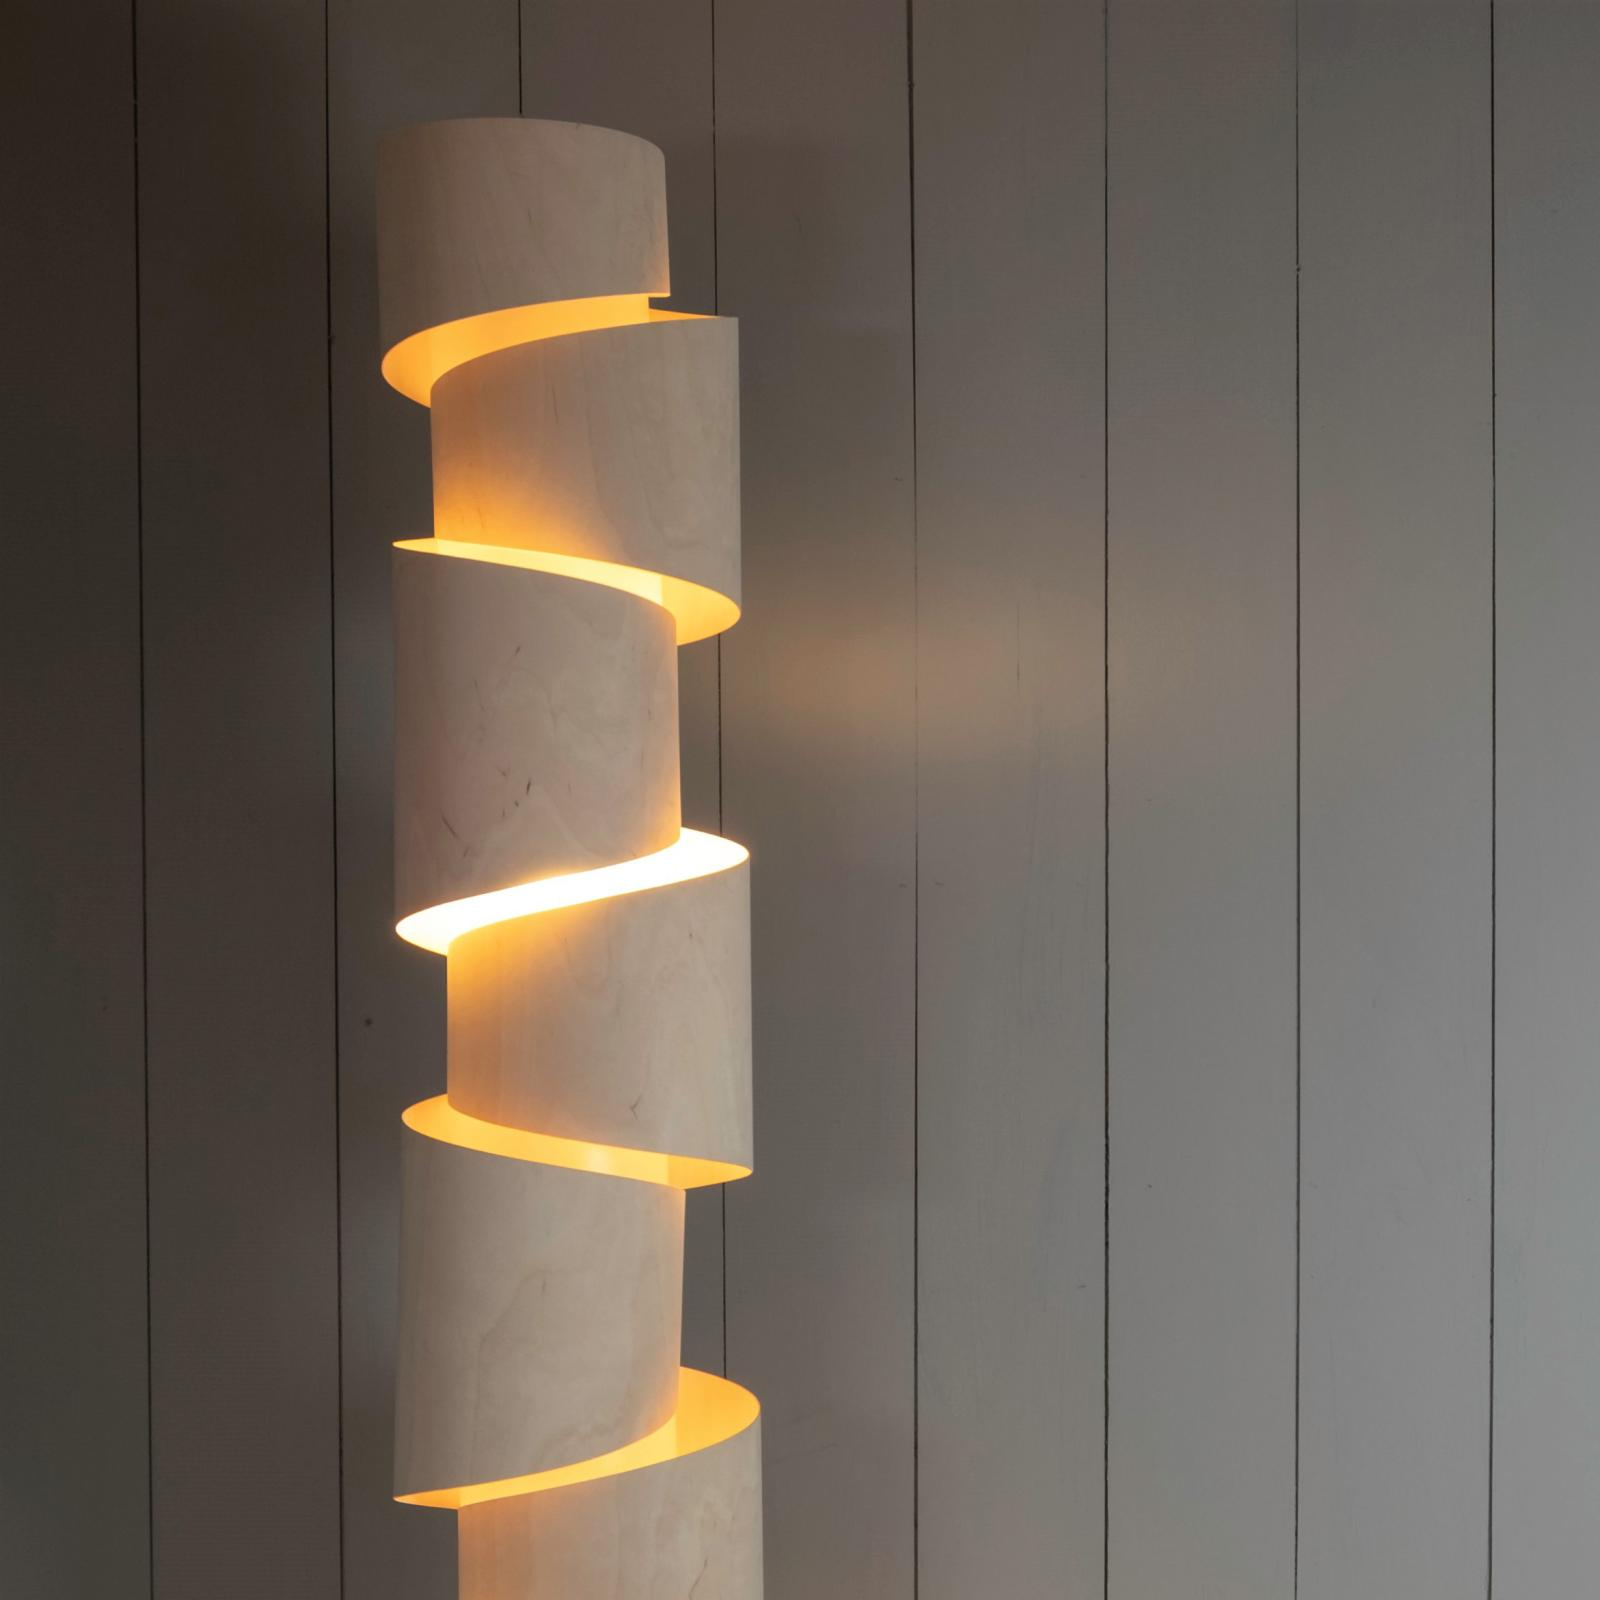 Floor Lamps and Designer Lights